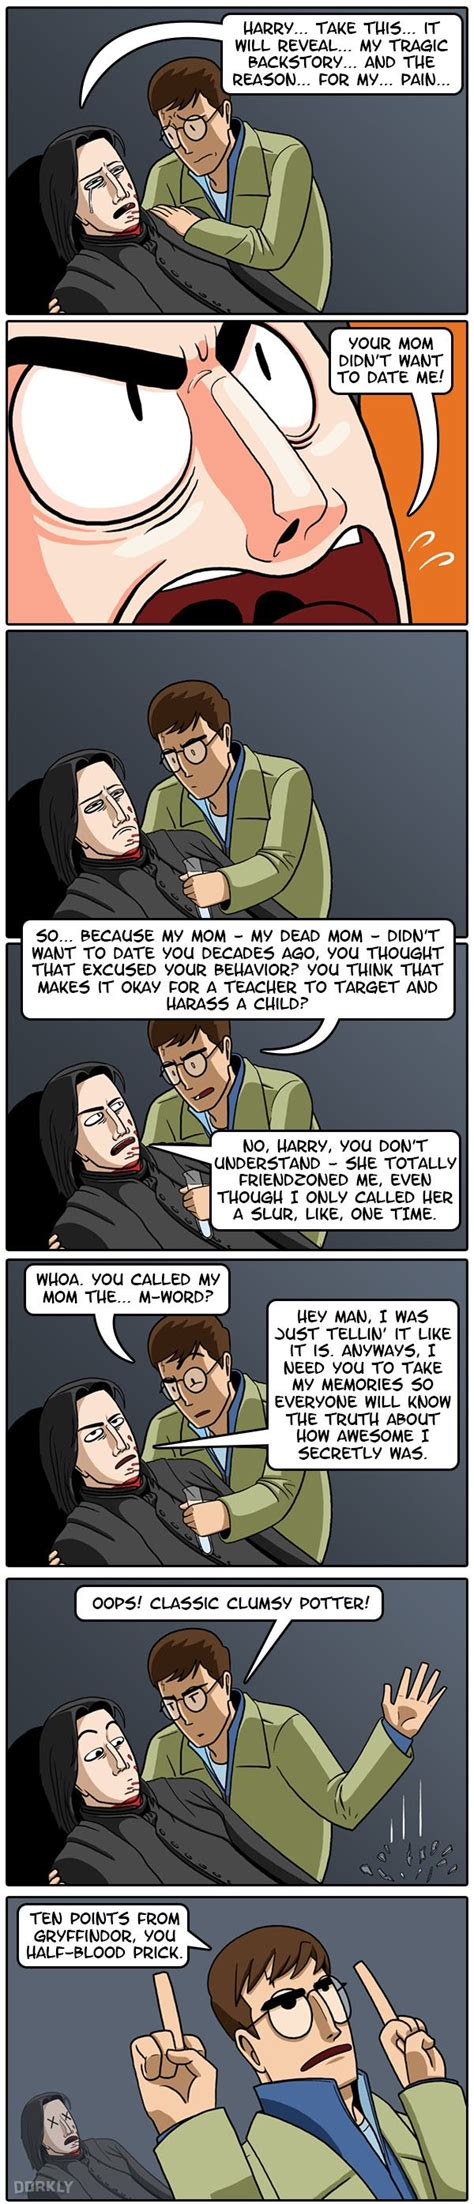 Harry Potter Learns Snape's Not So Tragic Backstory